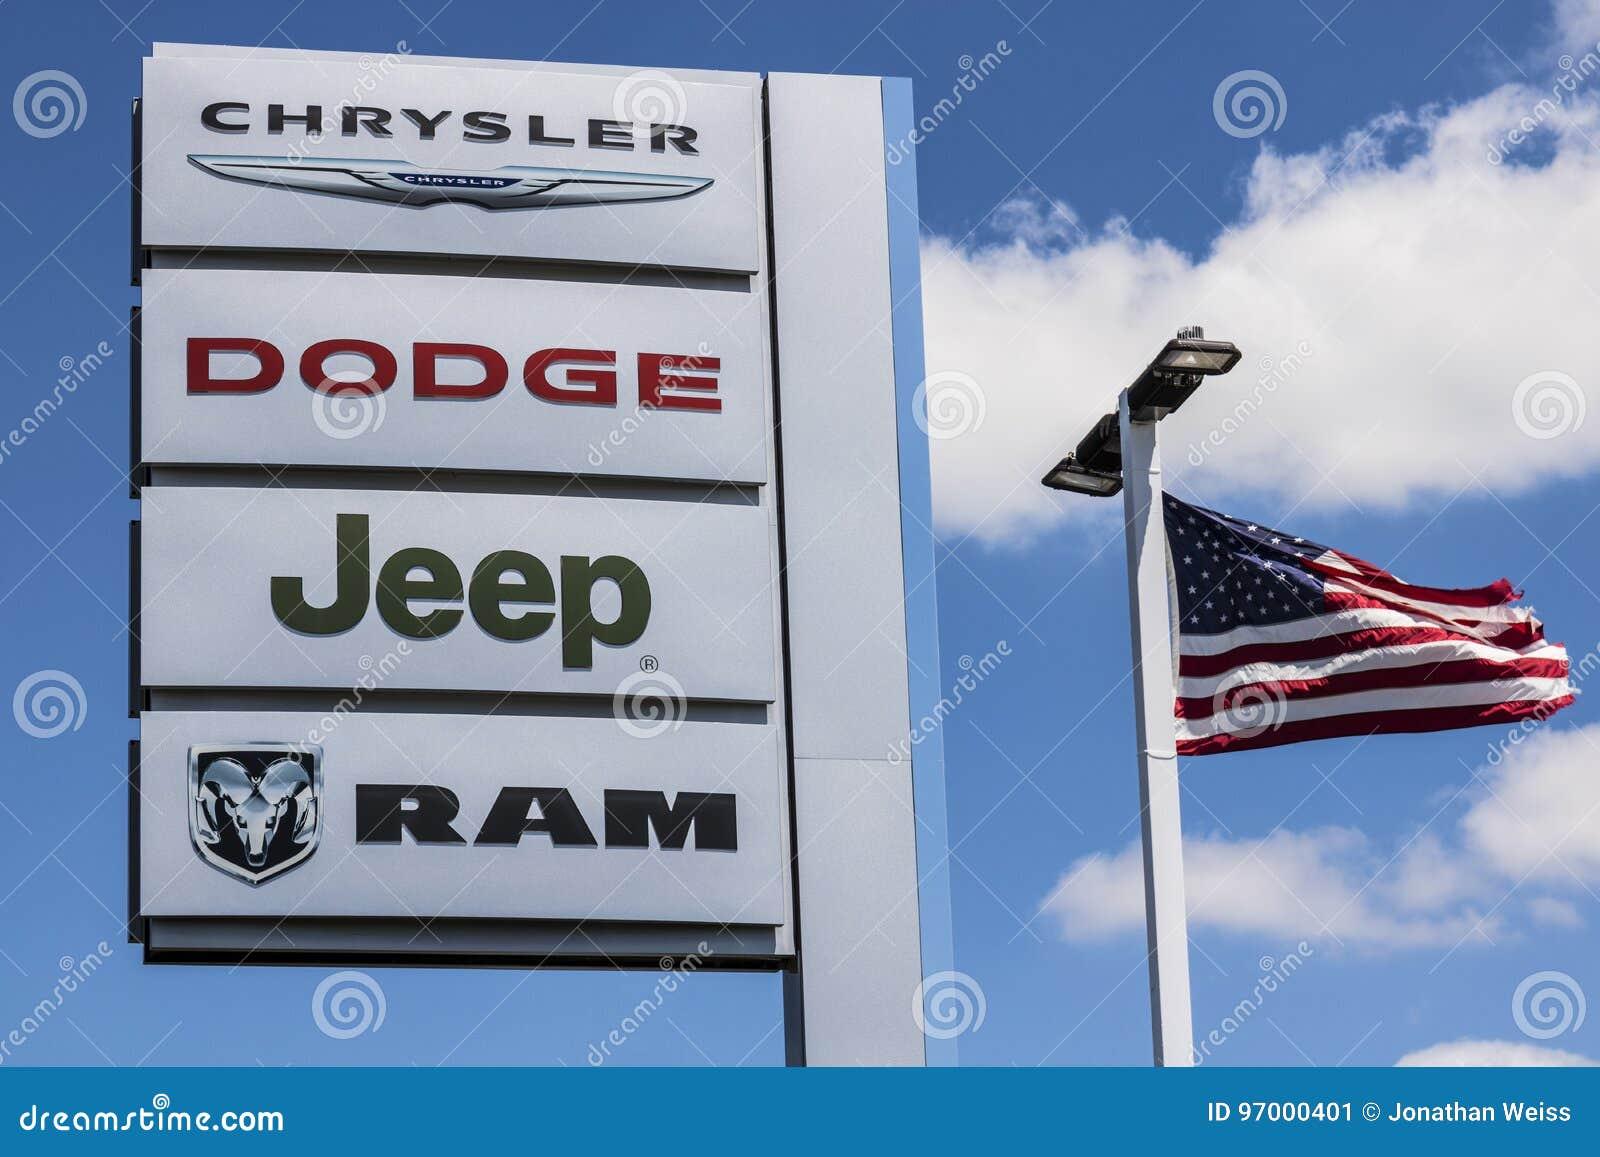 Dodge Dealership Indianapolis >> Indianapolis Circa July 2017 Logo And Dealership Signage Of The